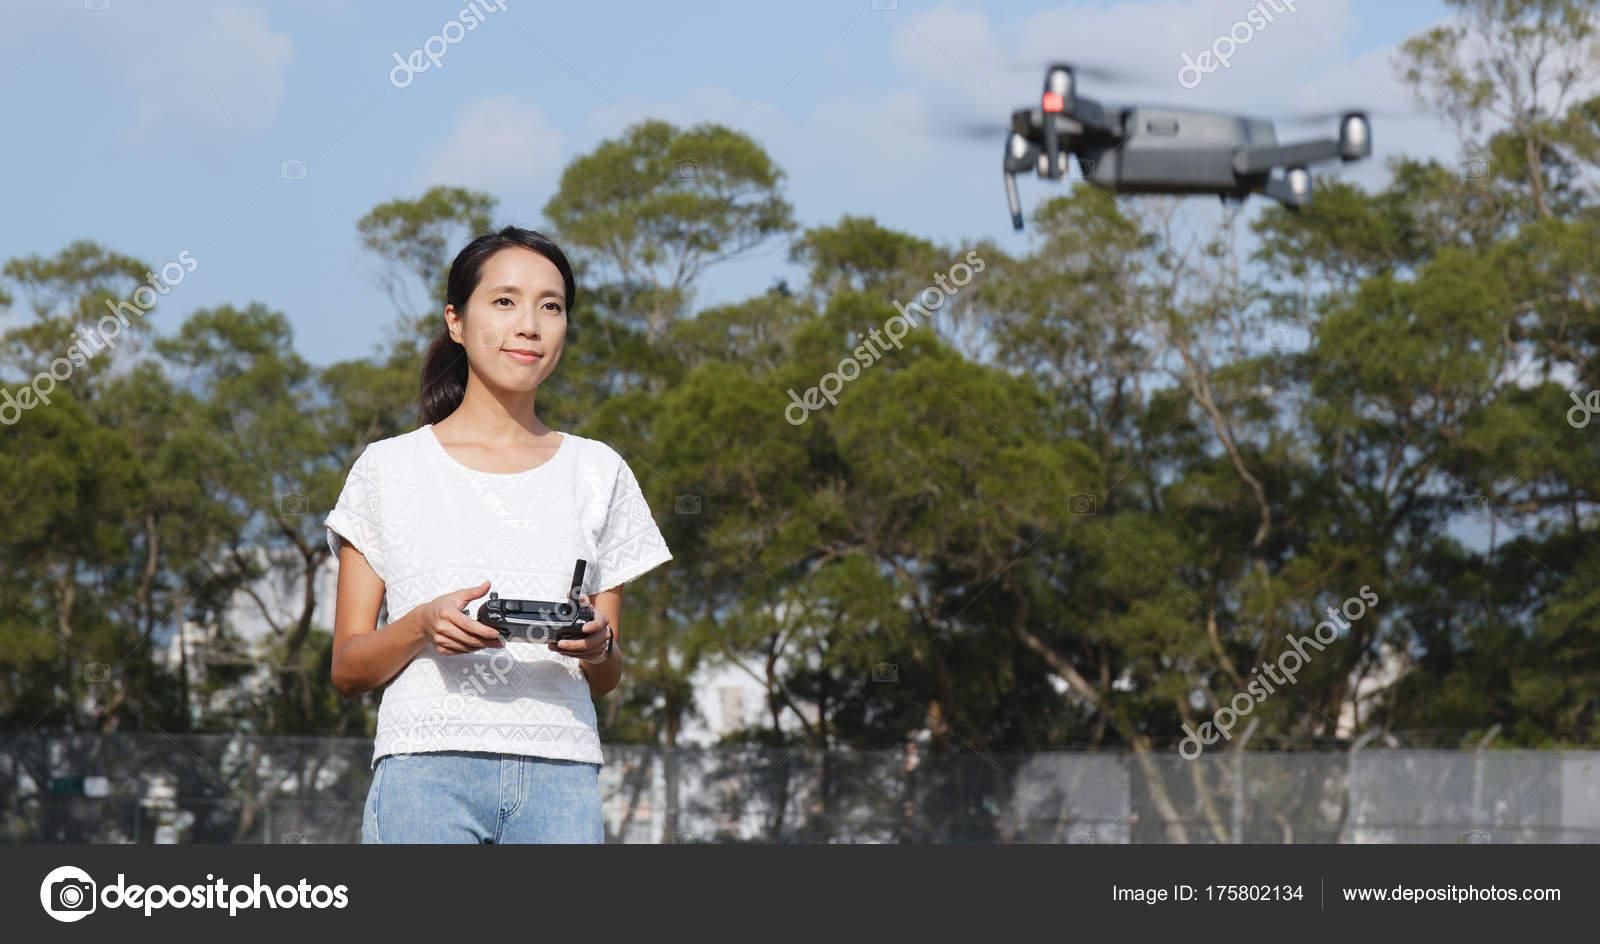 Woman Control Fly Drone Outdoor — Stock Photo © leungchopan